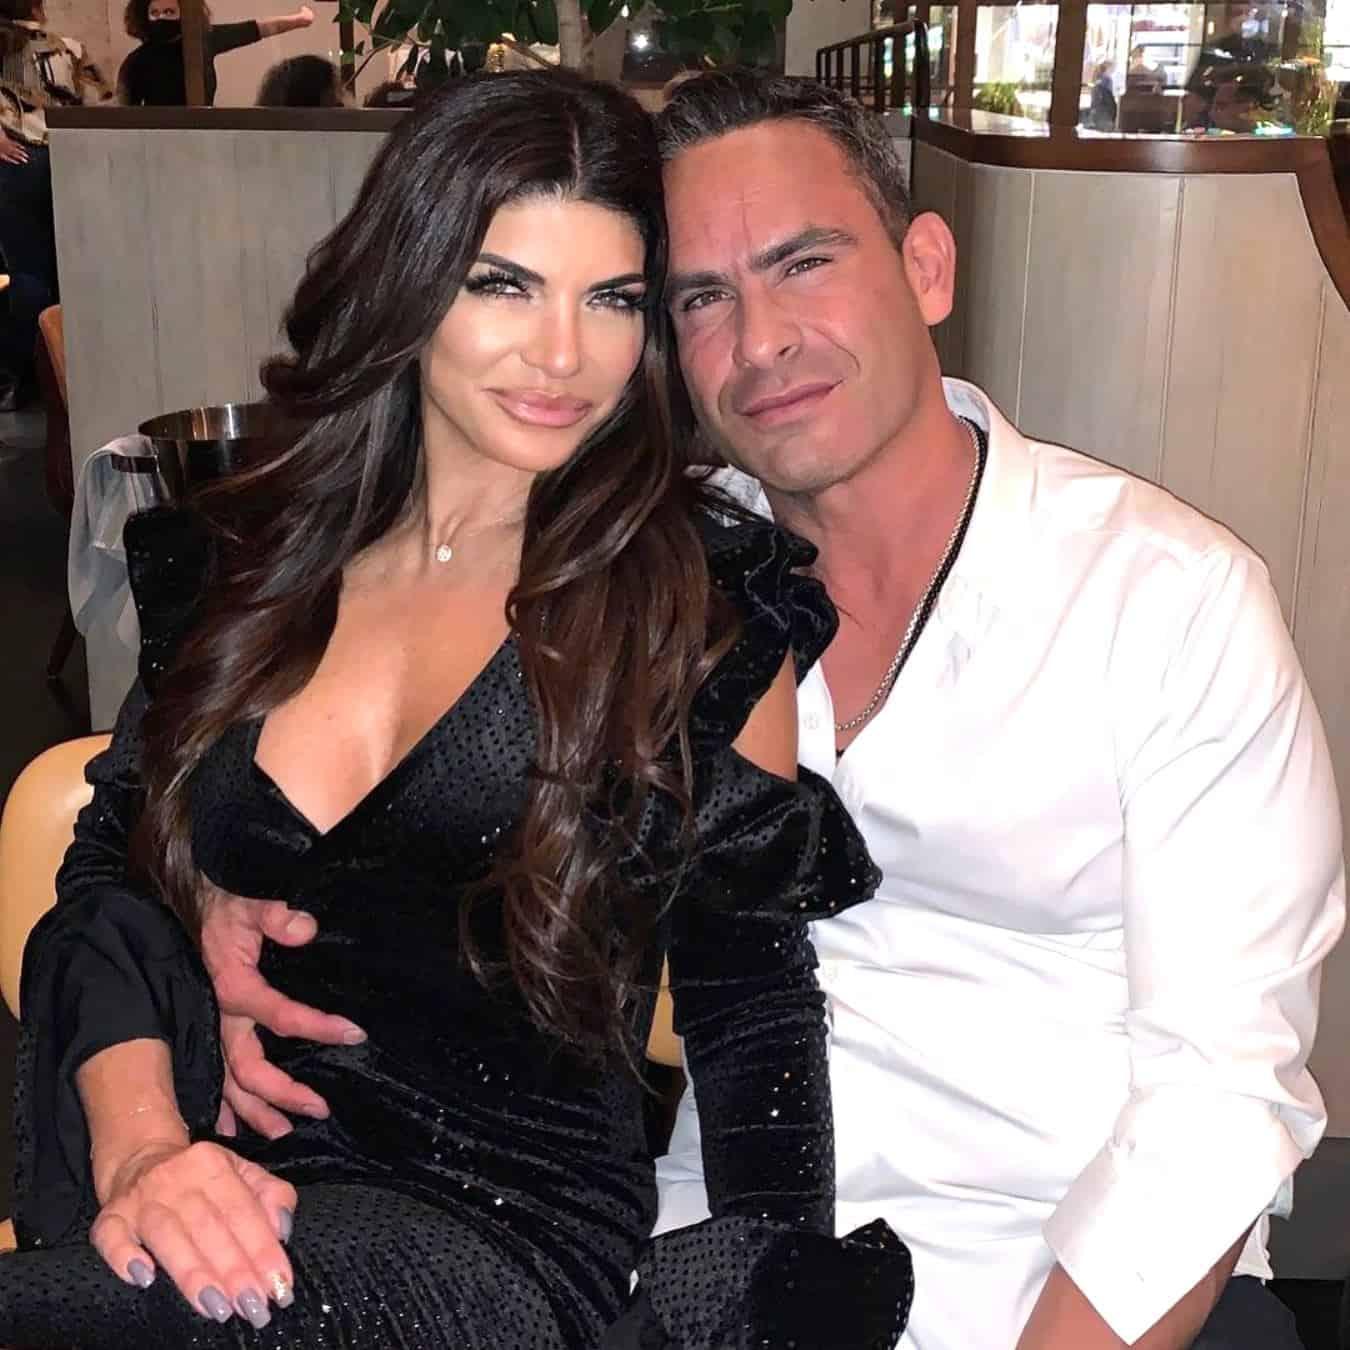 RHONJ star Teresa Giudice poses sitting down with new boyfriend Luis Ruelas